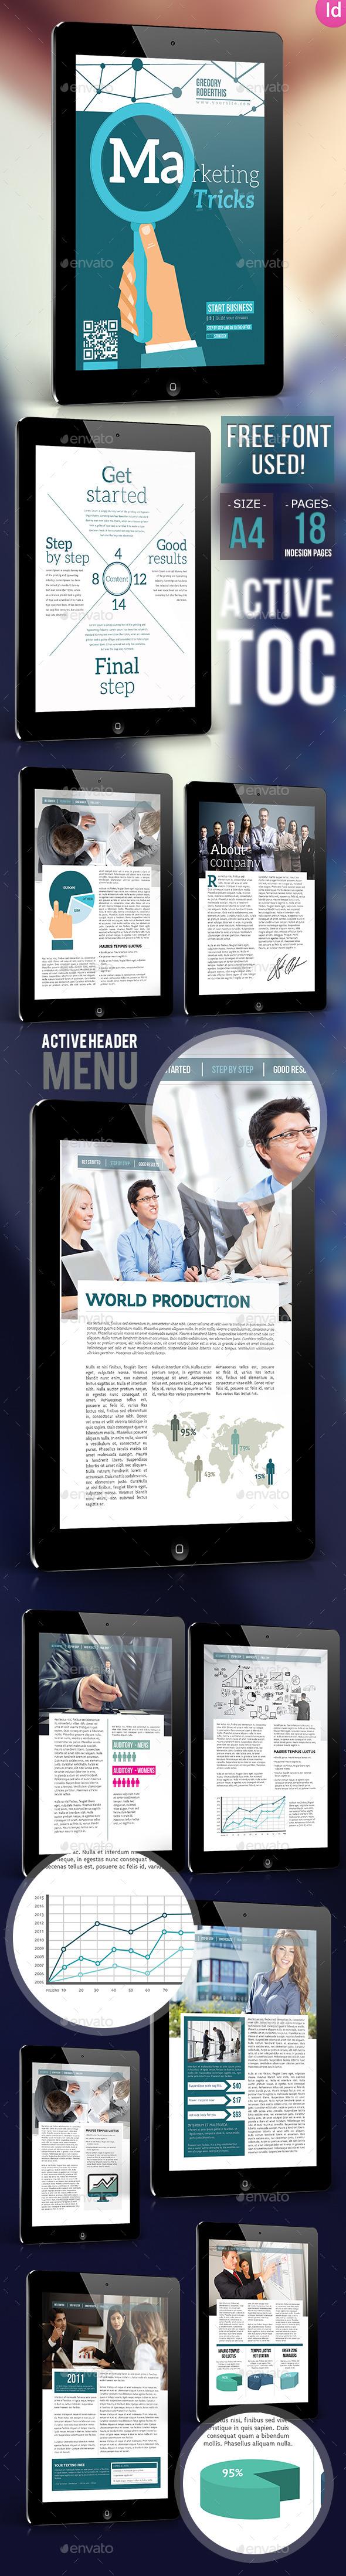 Marketing Trick E-book For Indesign - Digital Books ePublishing